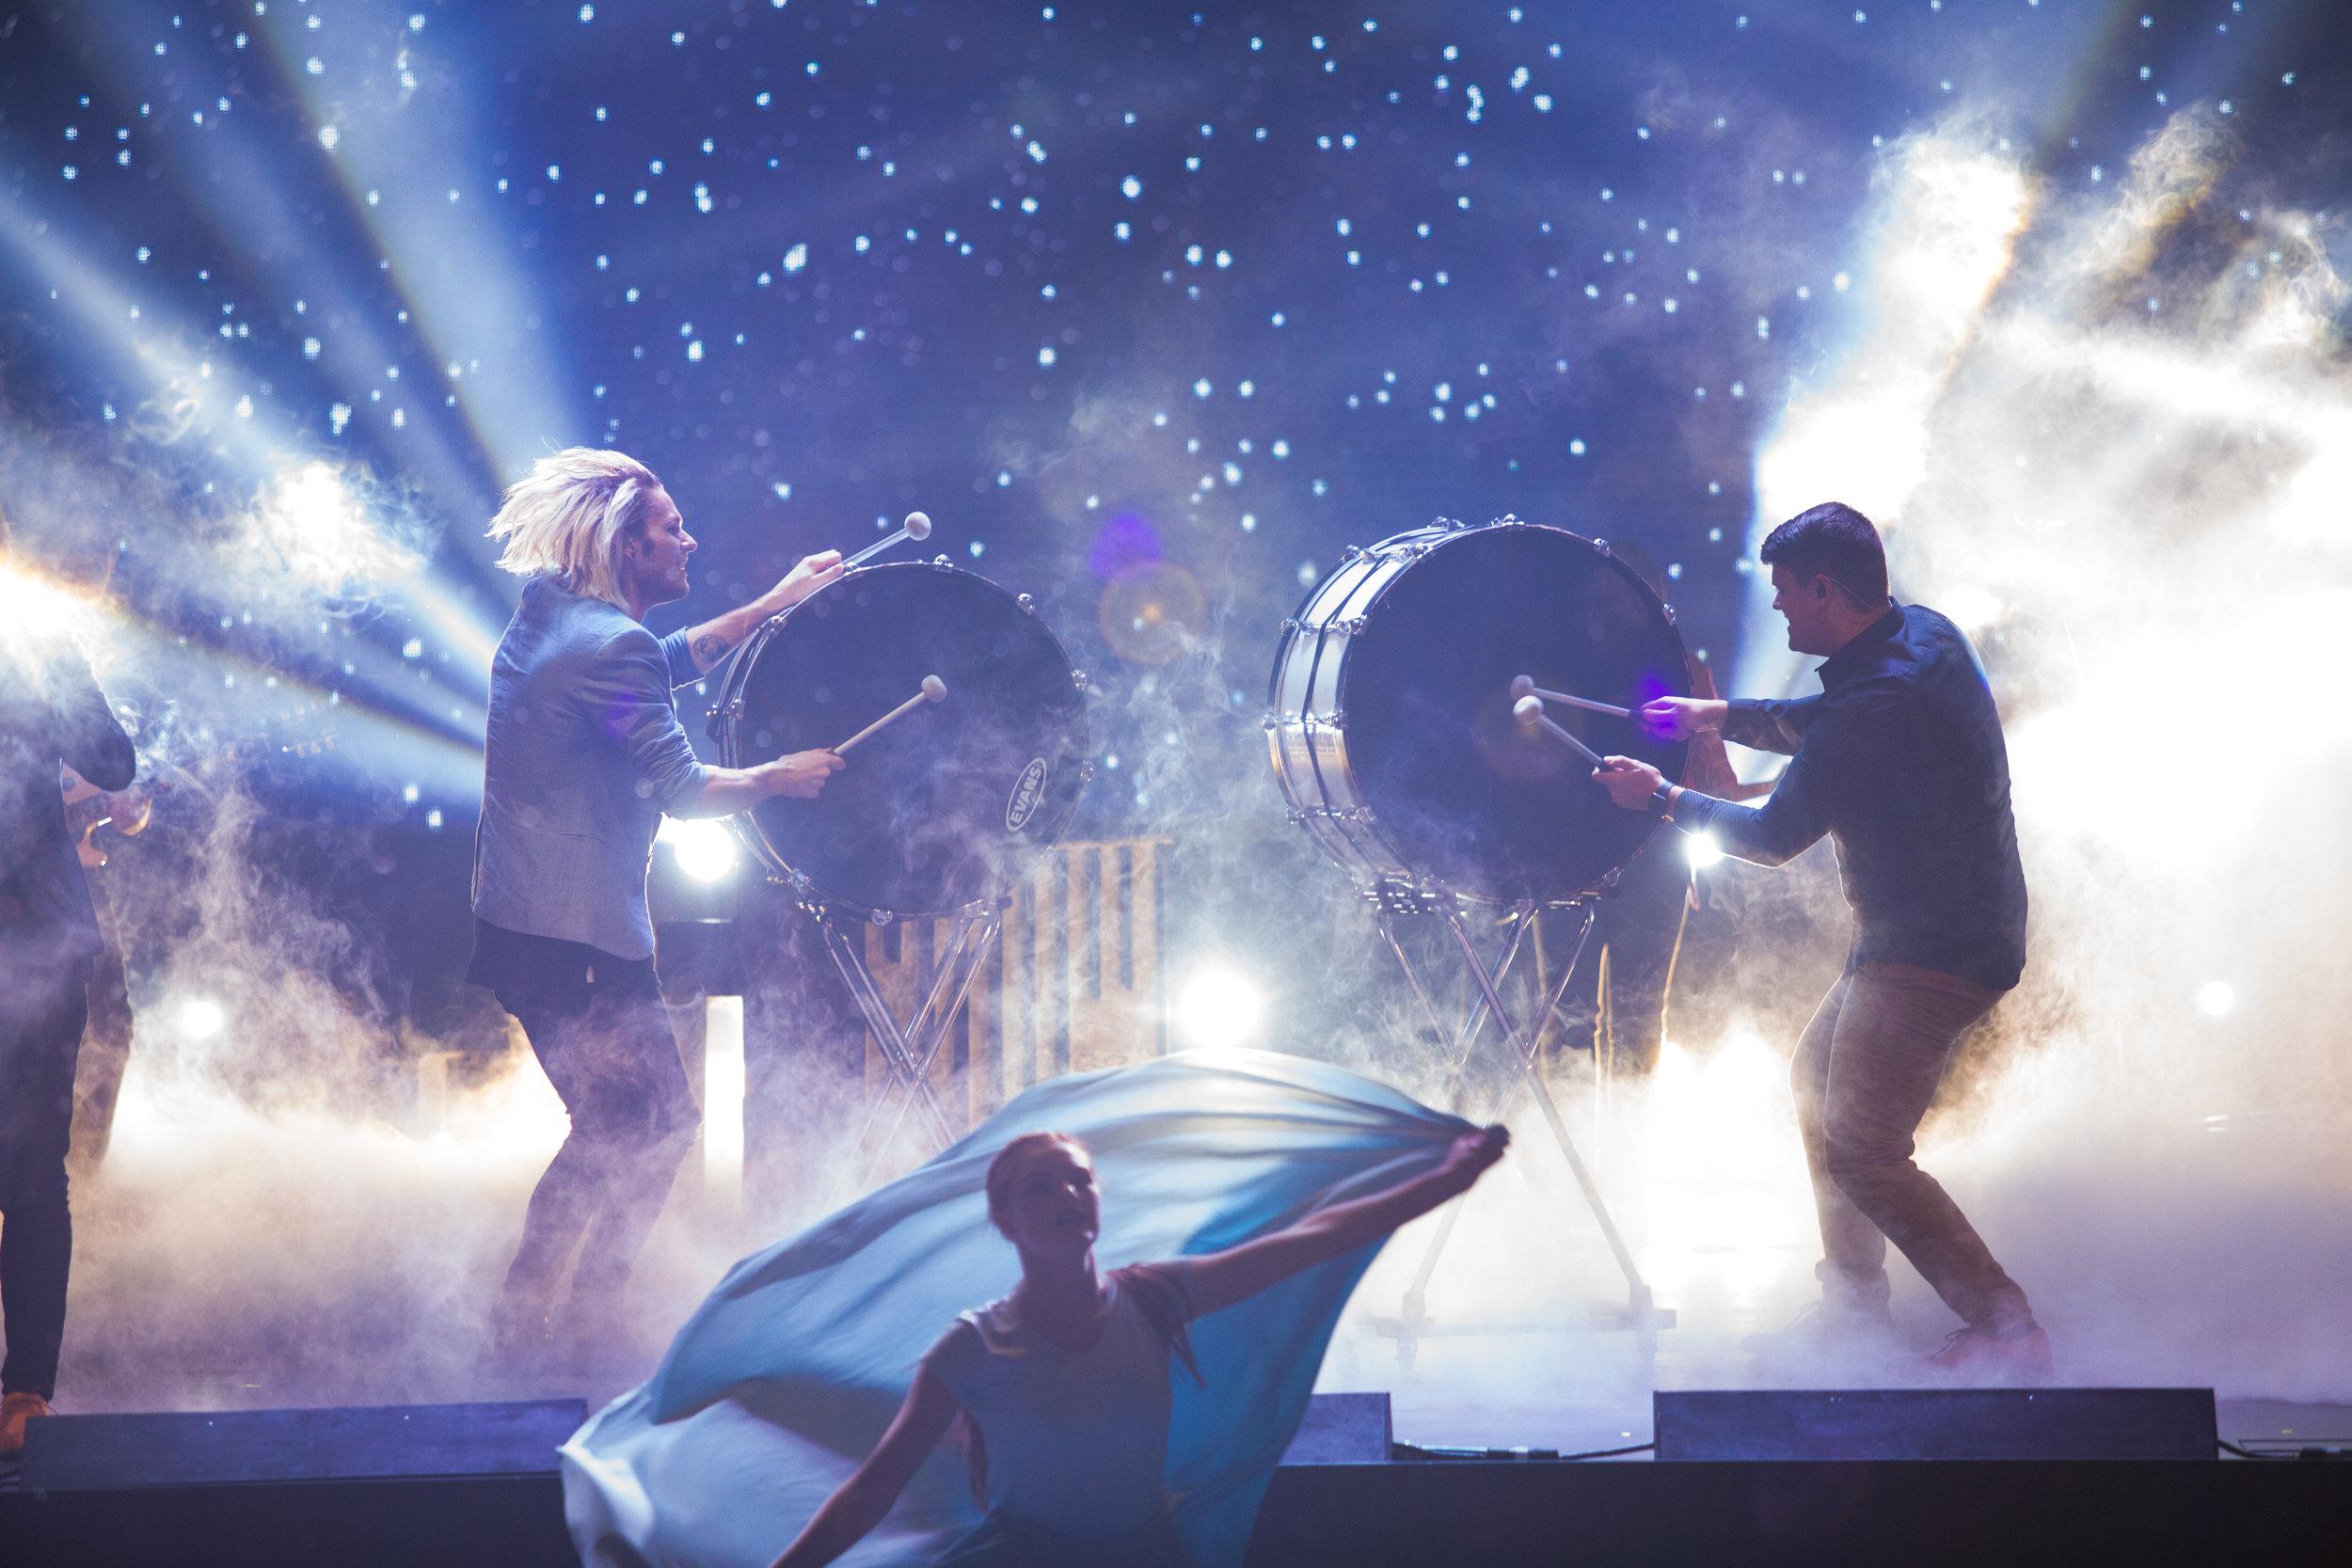 Epic light show na may drummers at mystic dancers sa crossroads talent show